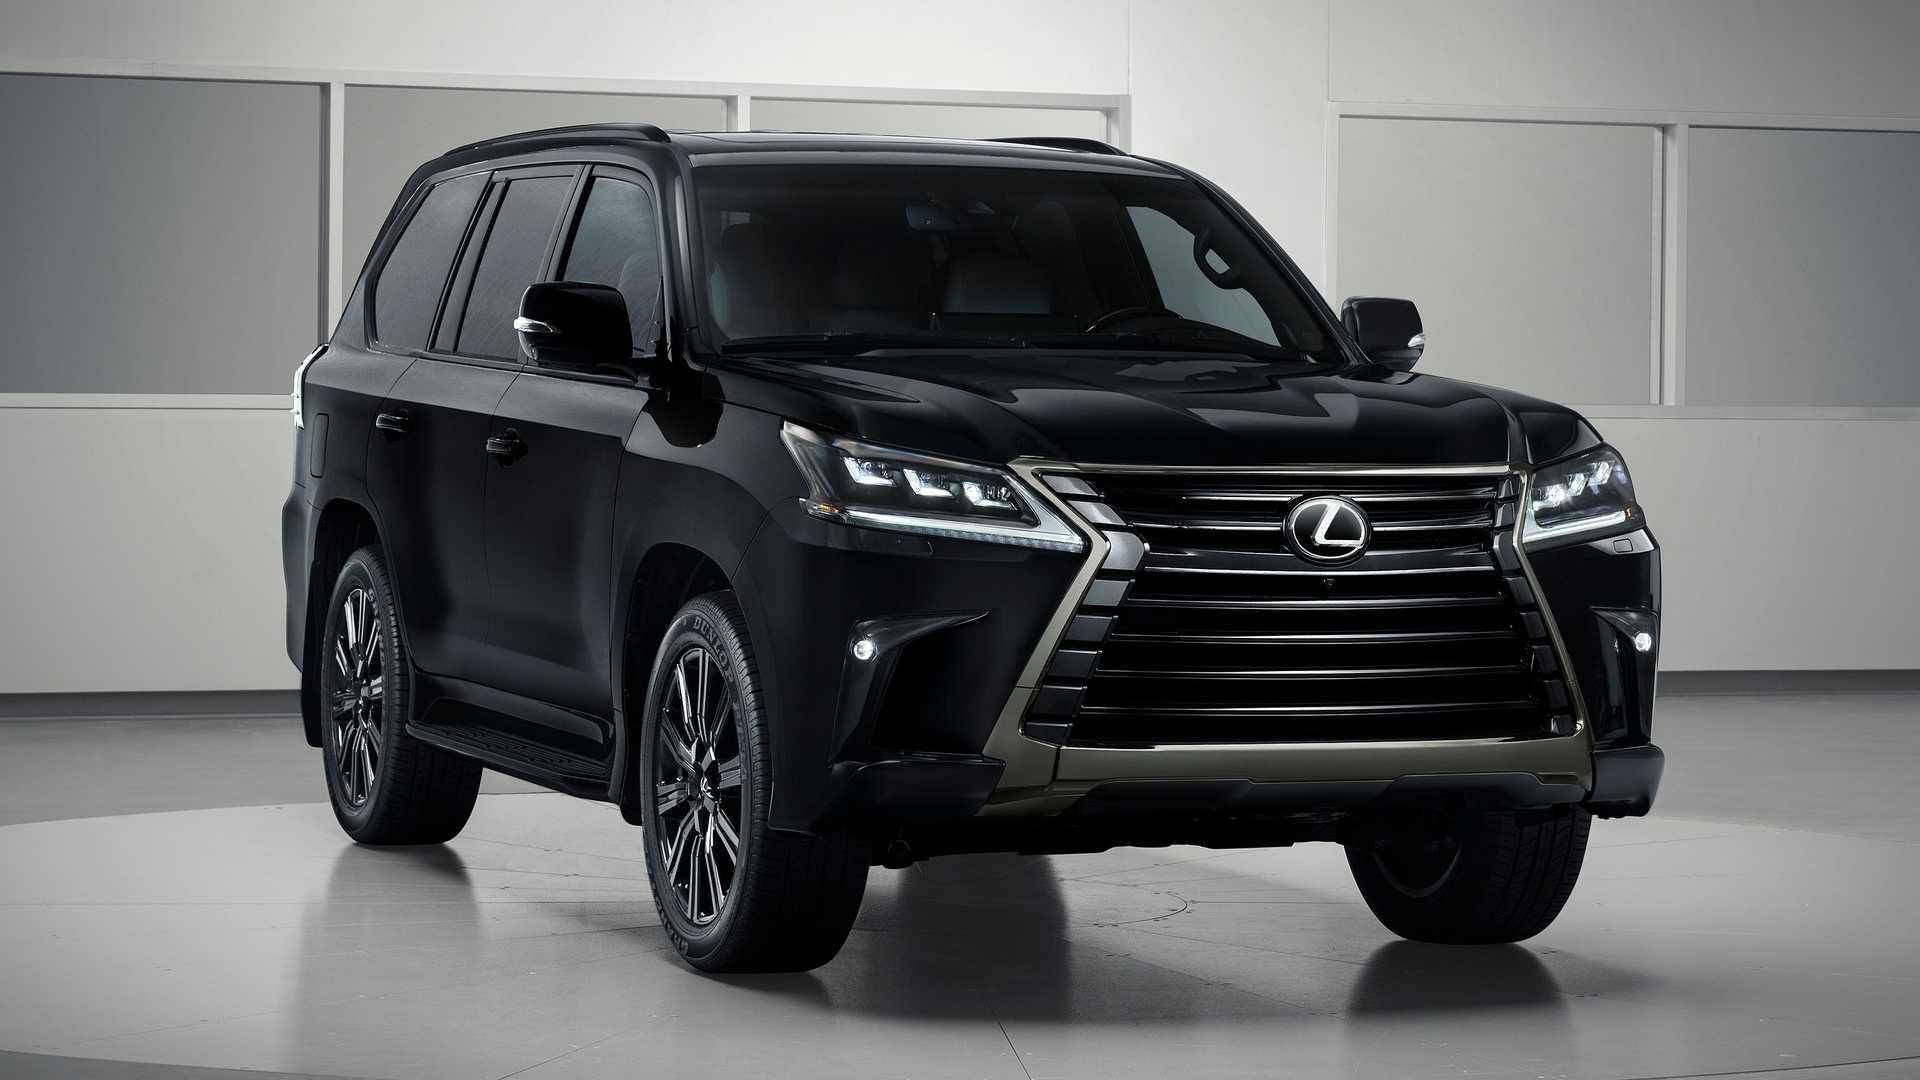 2019 Lexus Lx Inspiration Series Revealed In Black Onyx